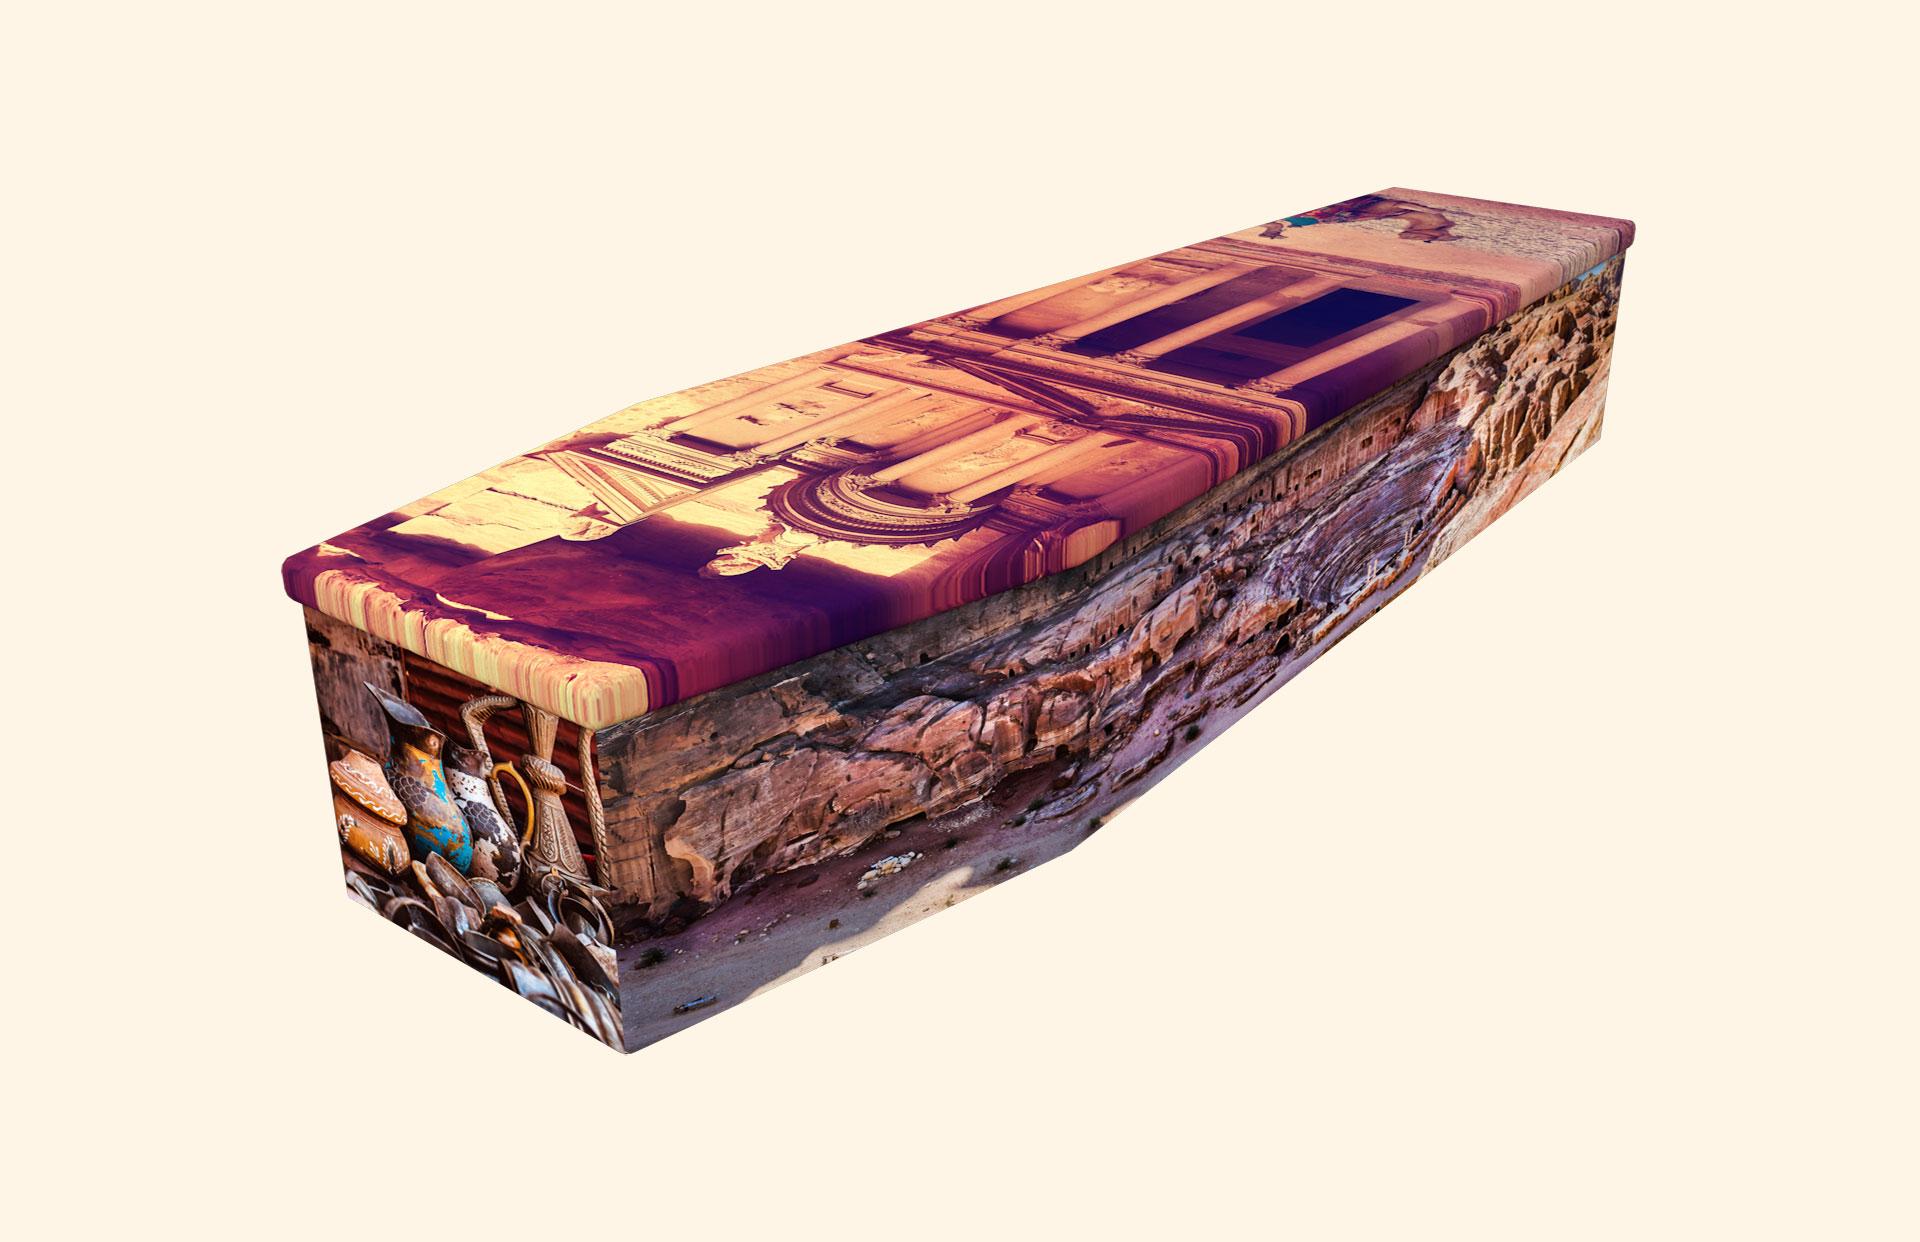 Petra the Lost City cardboard coffin